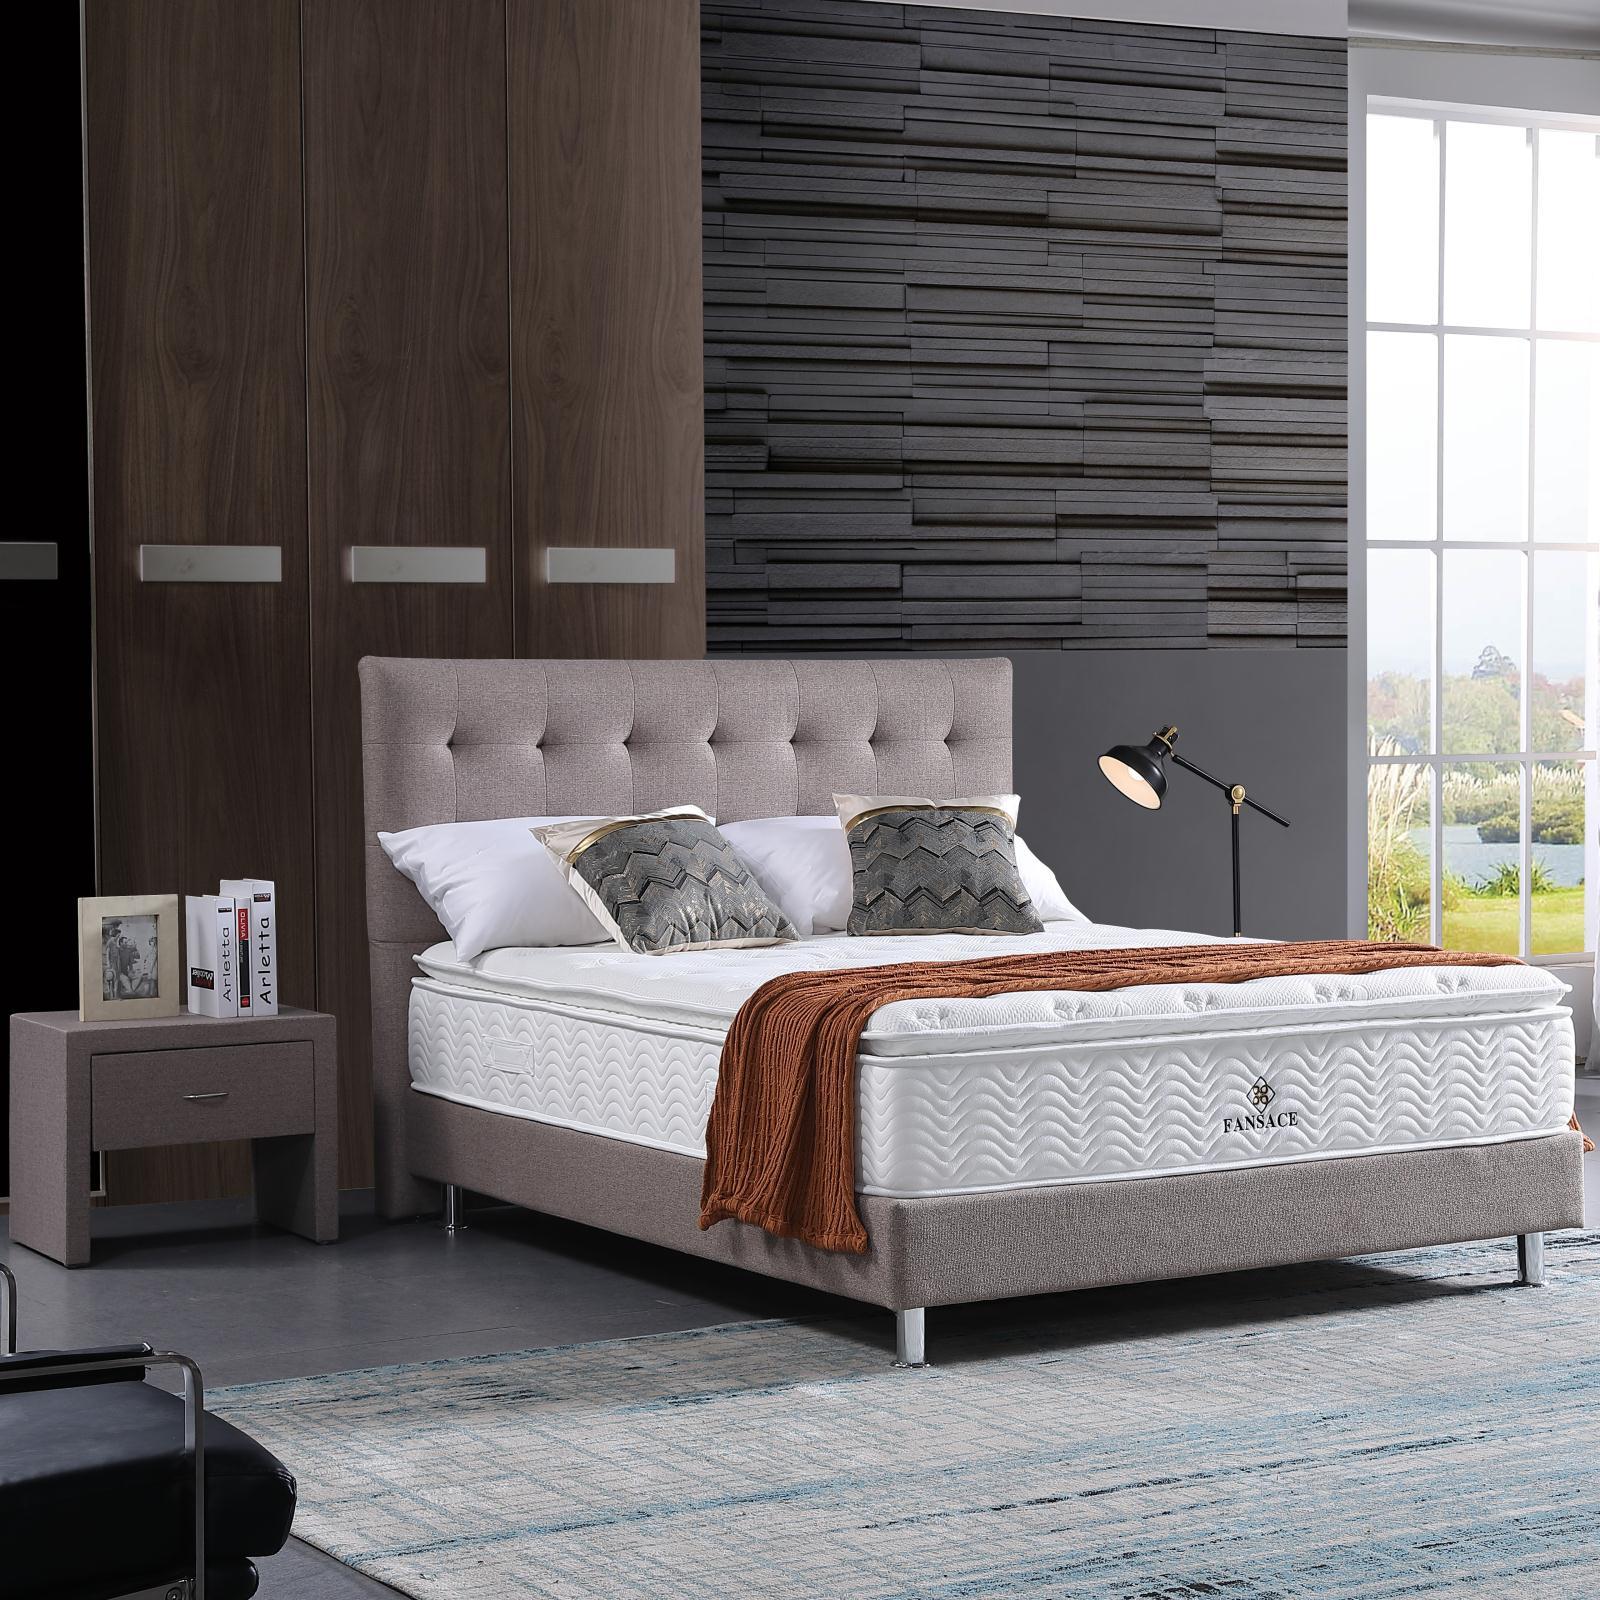 inexpensive platform bed mattress memory price with softness-1